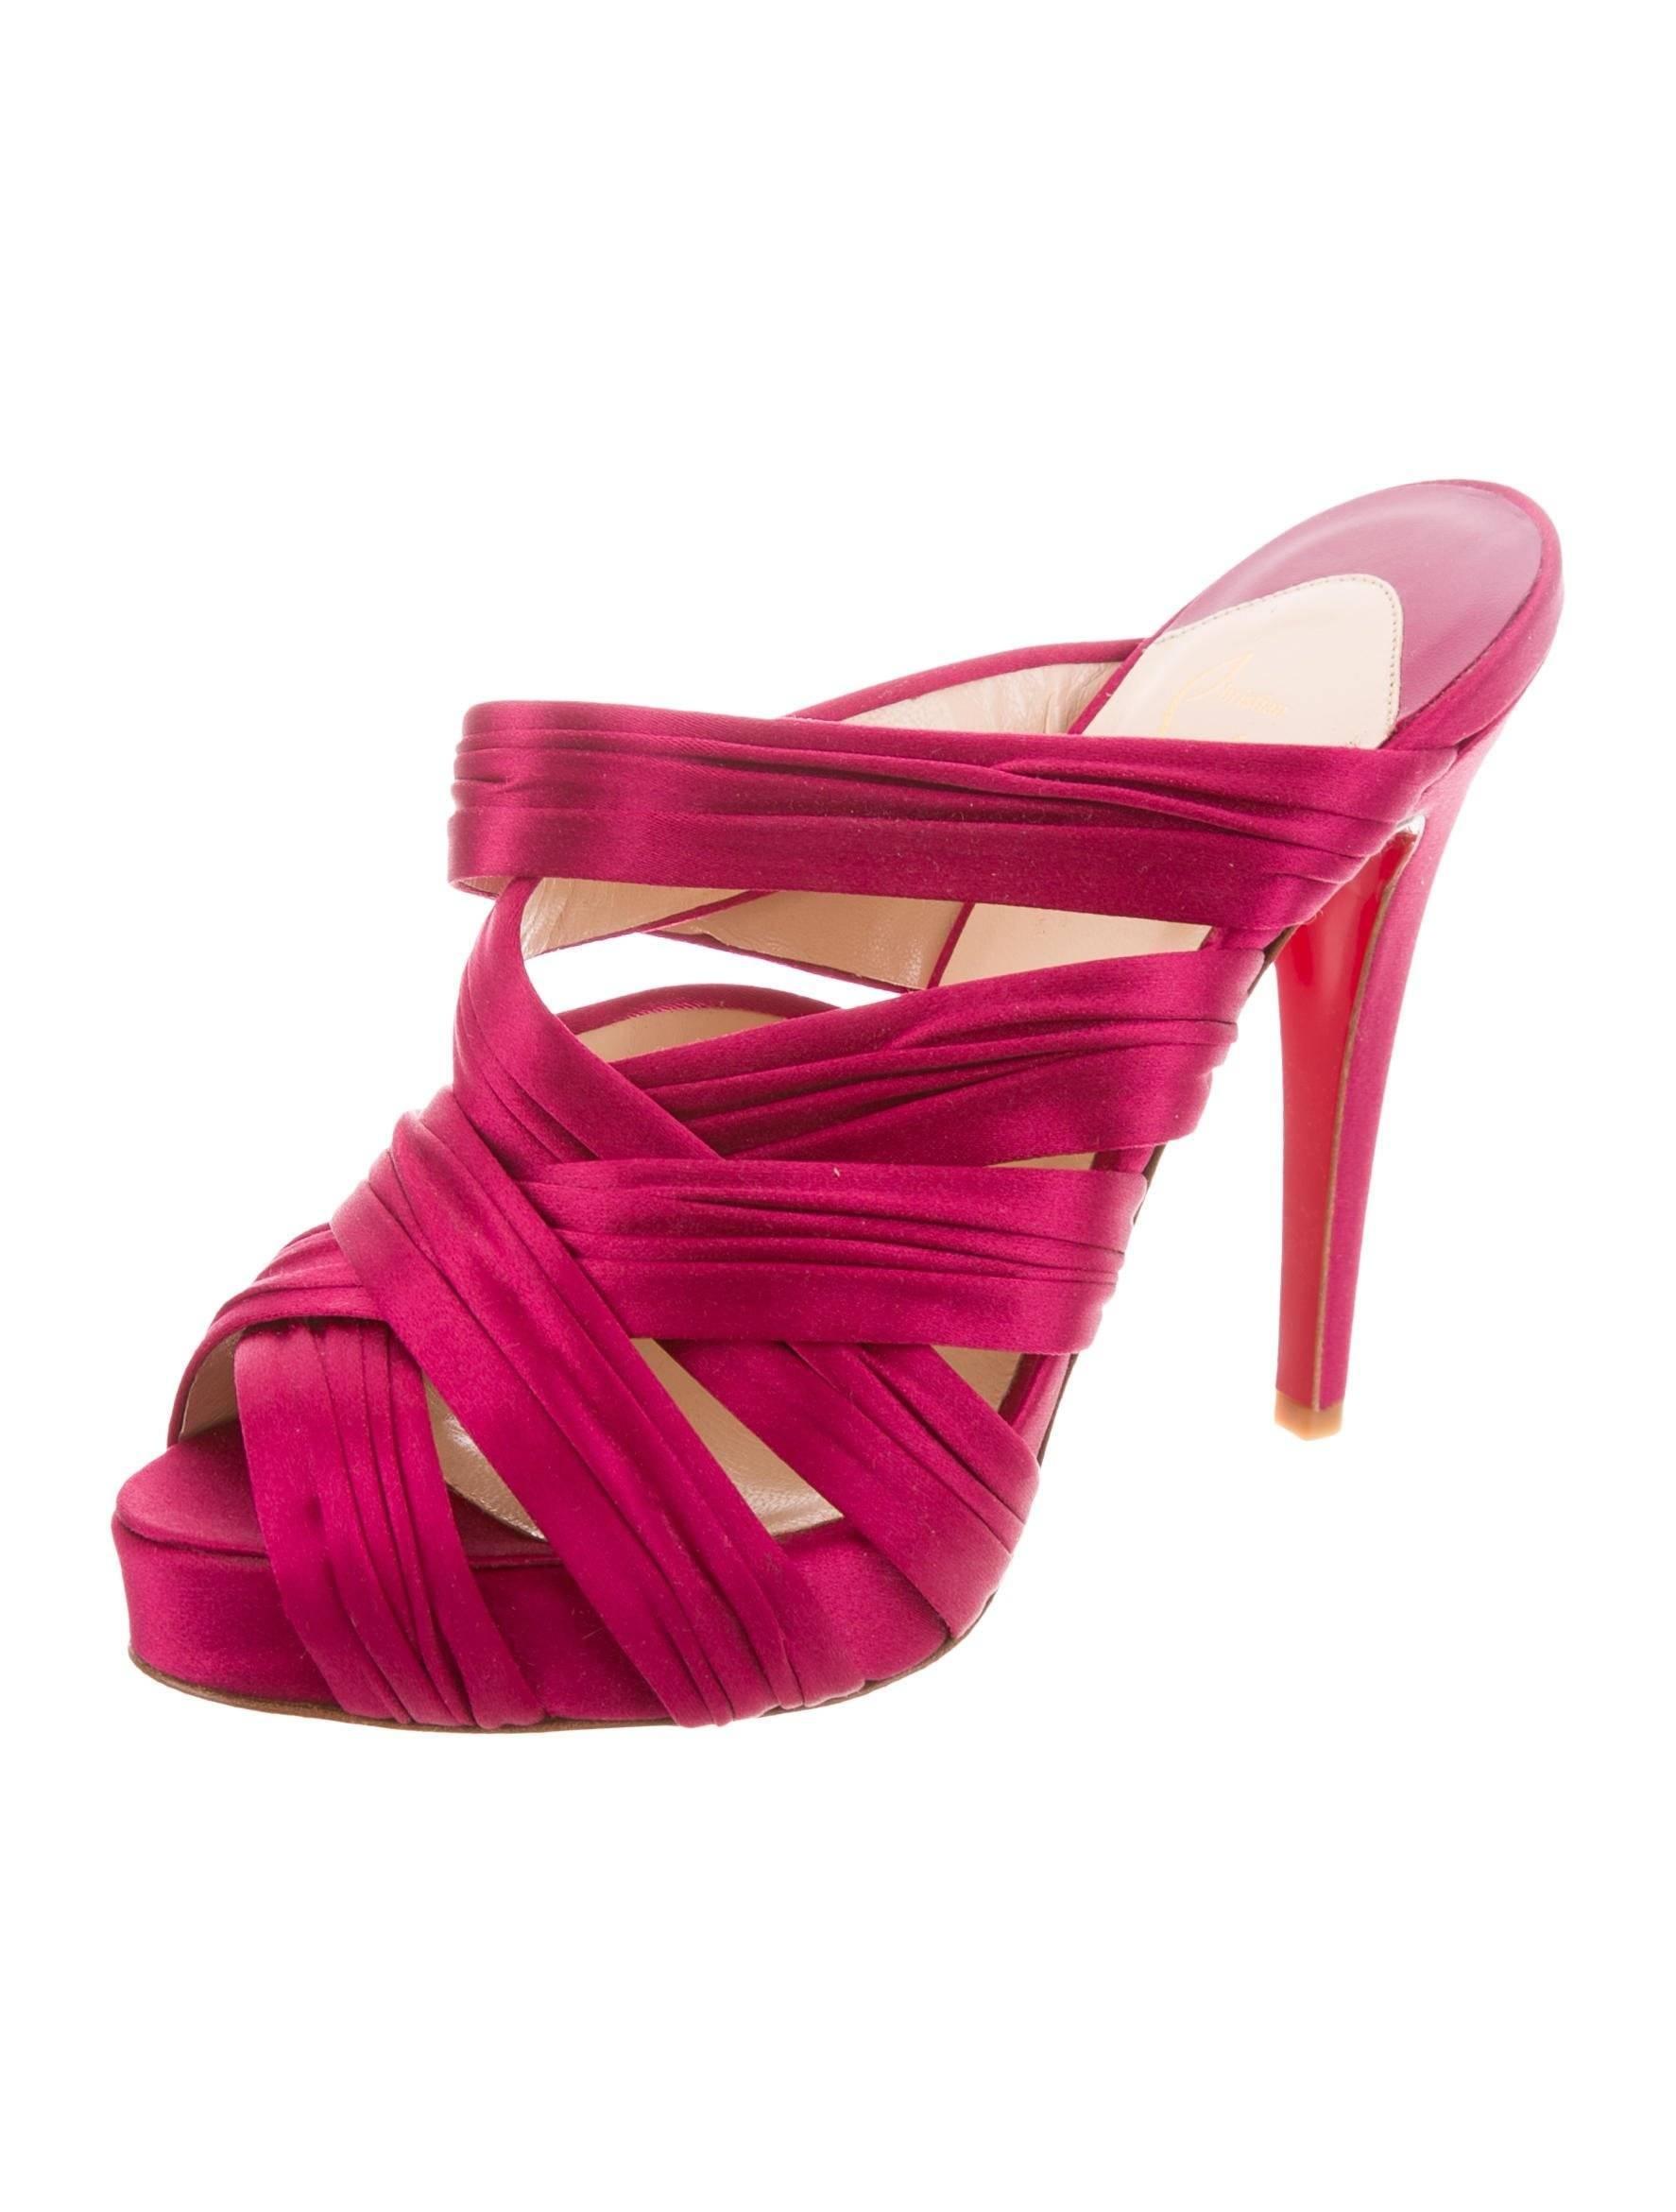 e03bb363aeb Christian Louboutin NEW Fuschia Satin Slide in Evening Sandals Heels at  1stdibs